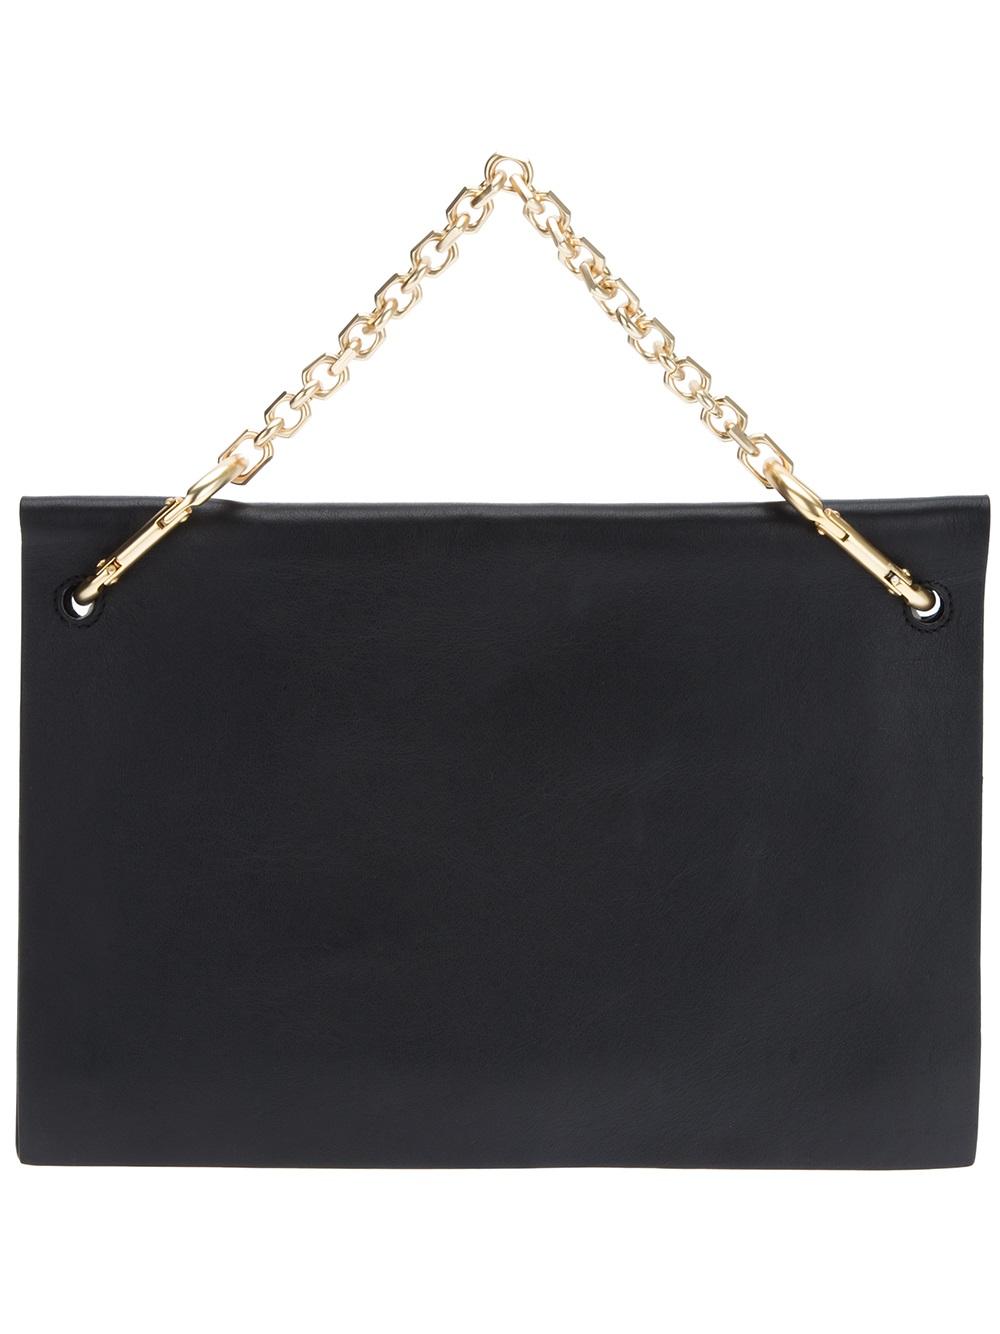 f507243bac Calvin Klein Envelope Clutch in Black - Lyst